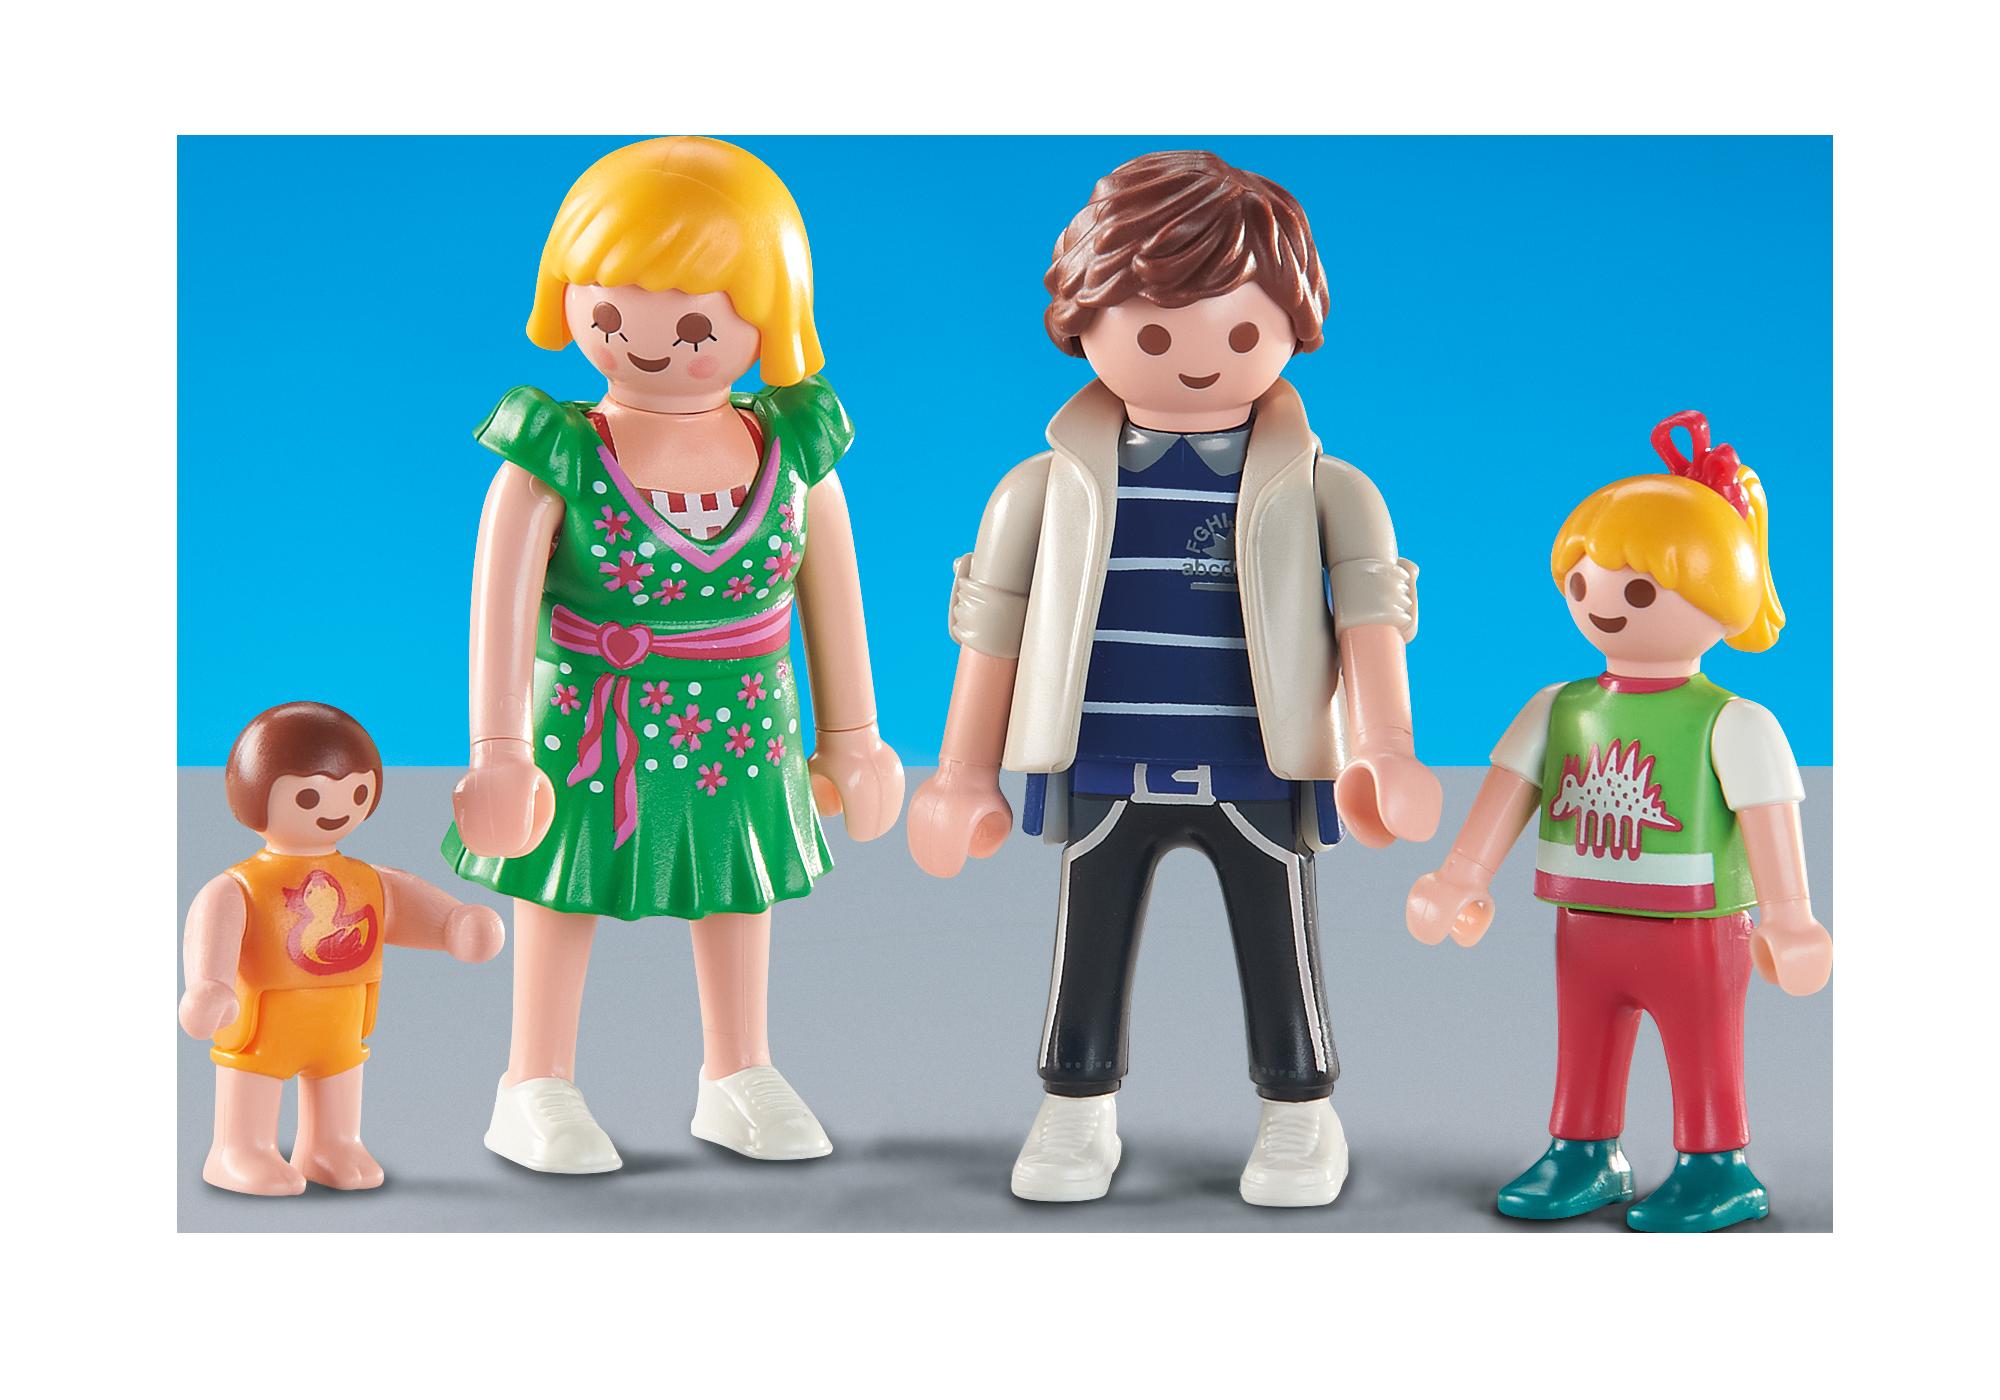 http://media.playmobil.com/i/playmobil/6530_product_detail/Family